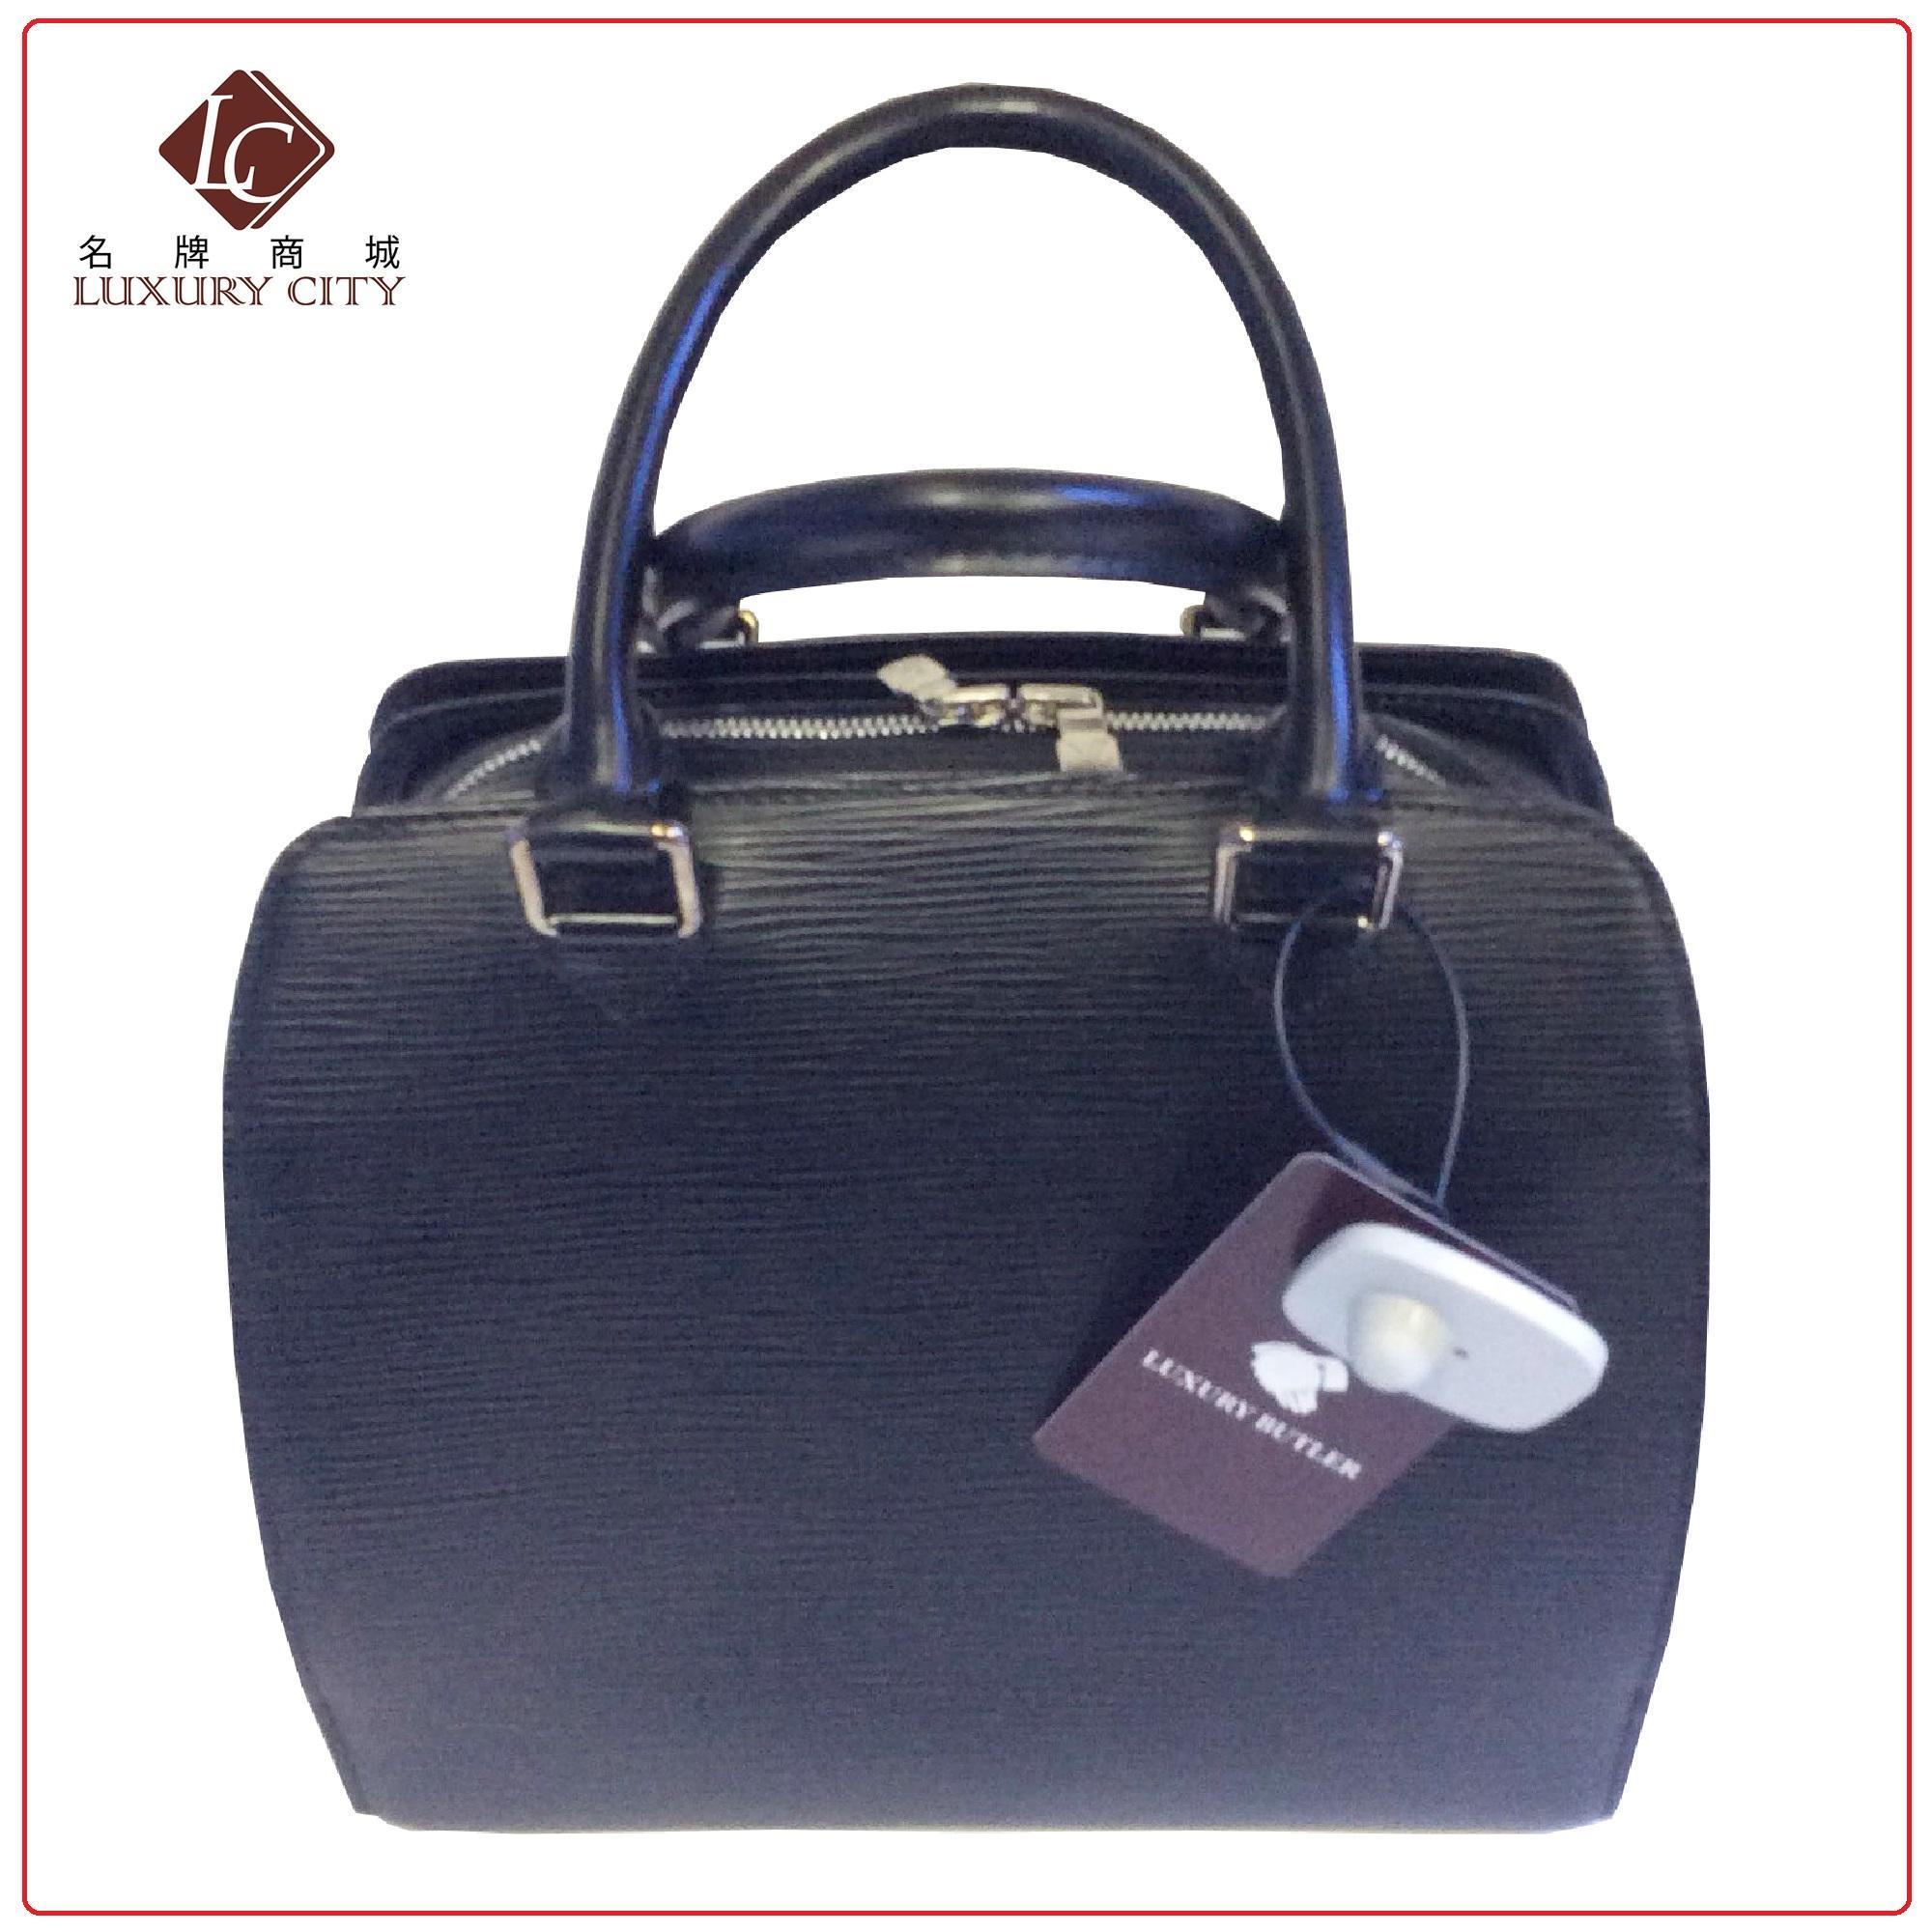 Singapore Preloved Authentic Louis Vuitton Handbag